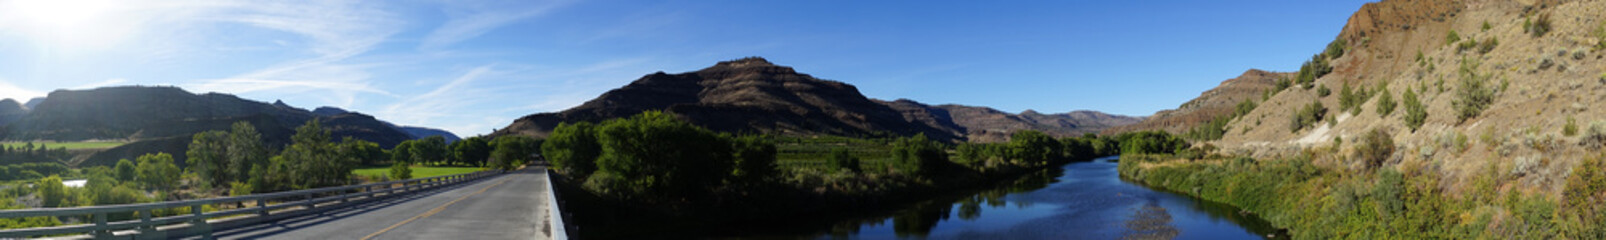 Wide Panoramic View John Day River Oregon Highway Bridge